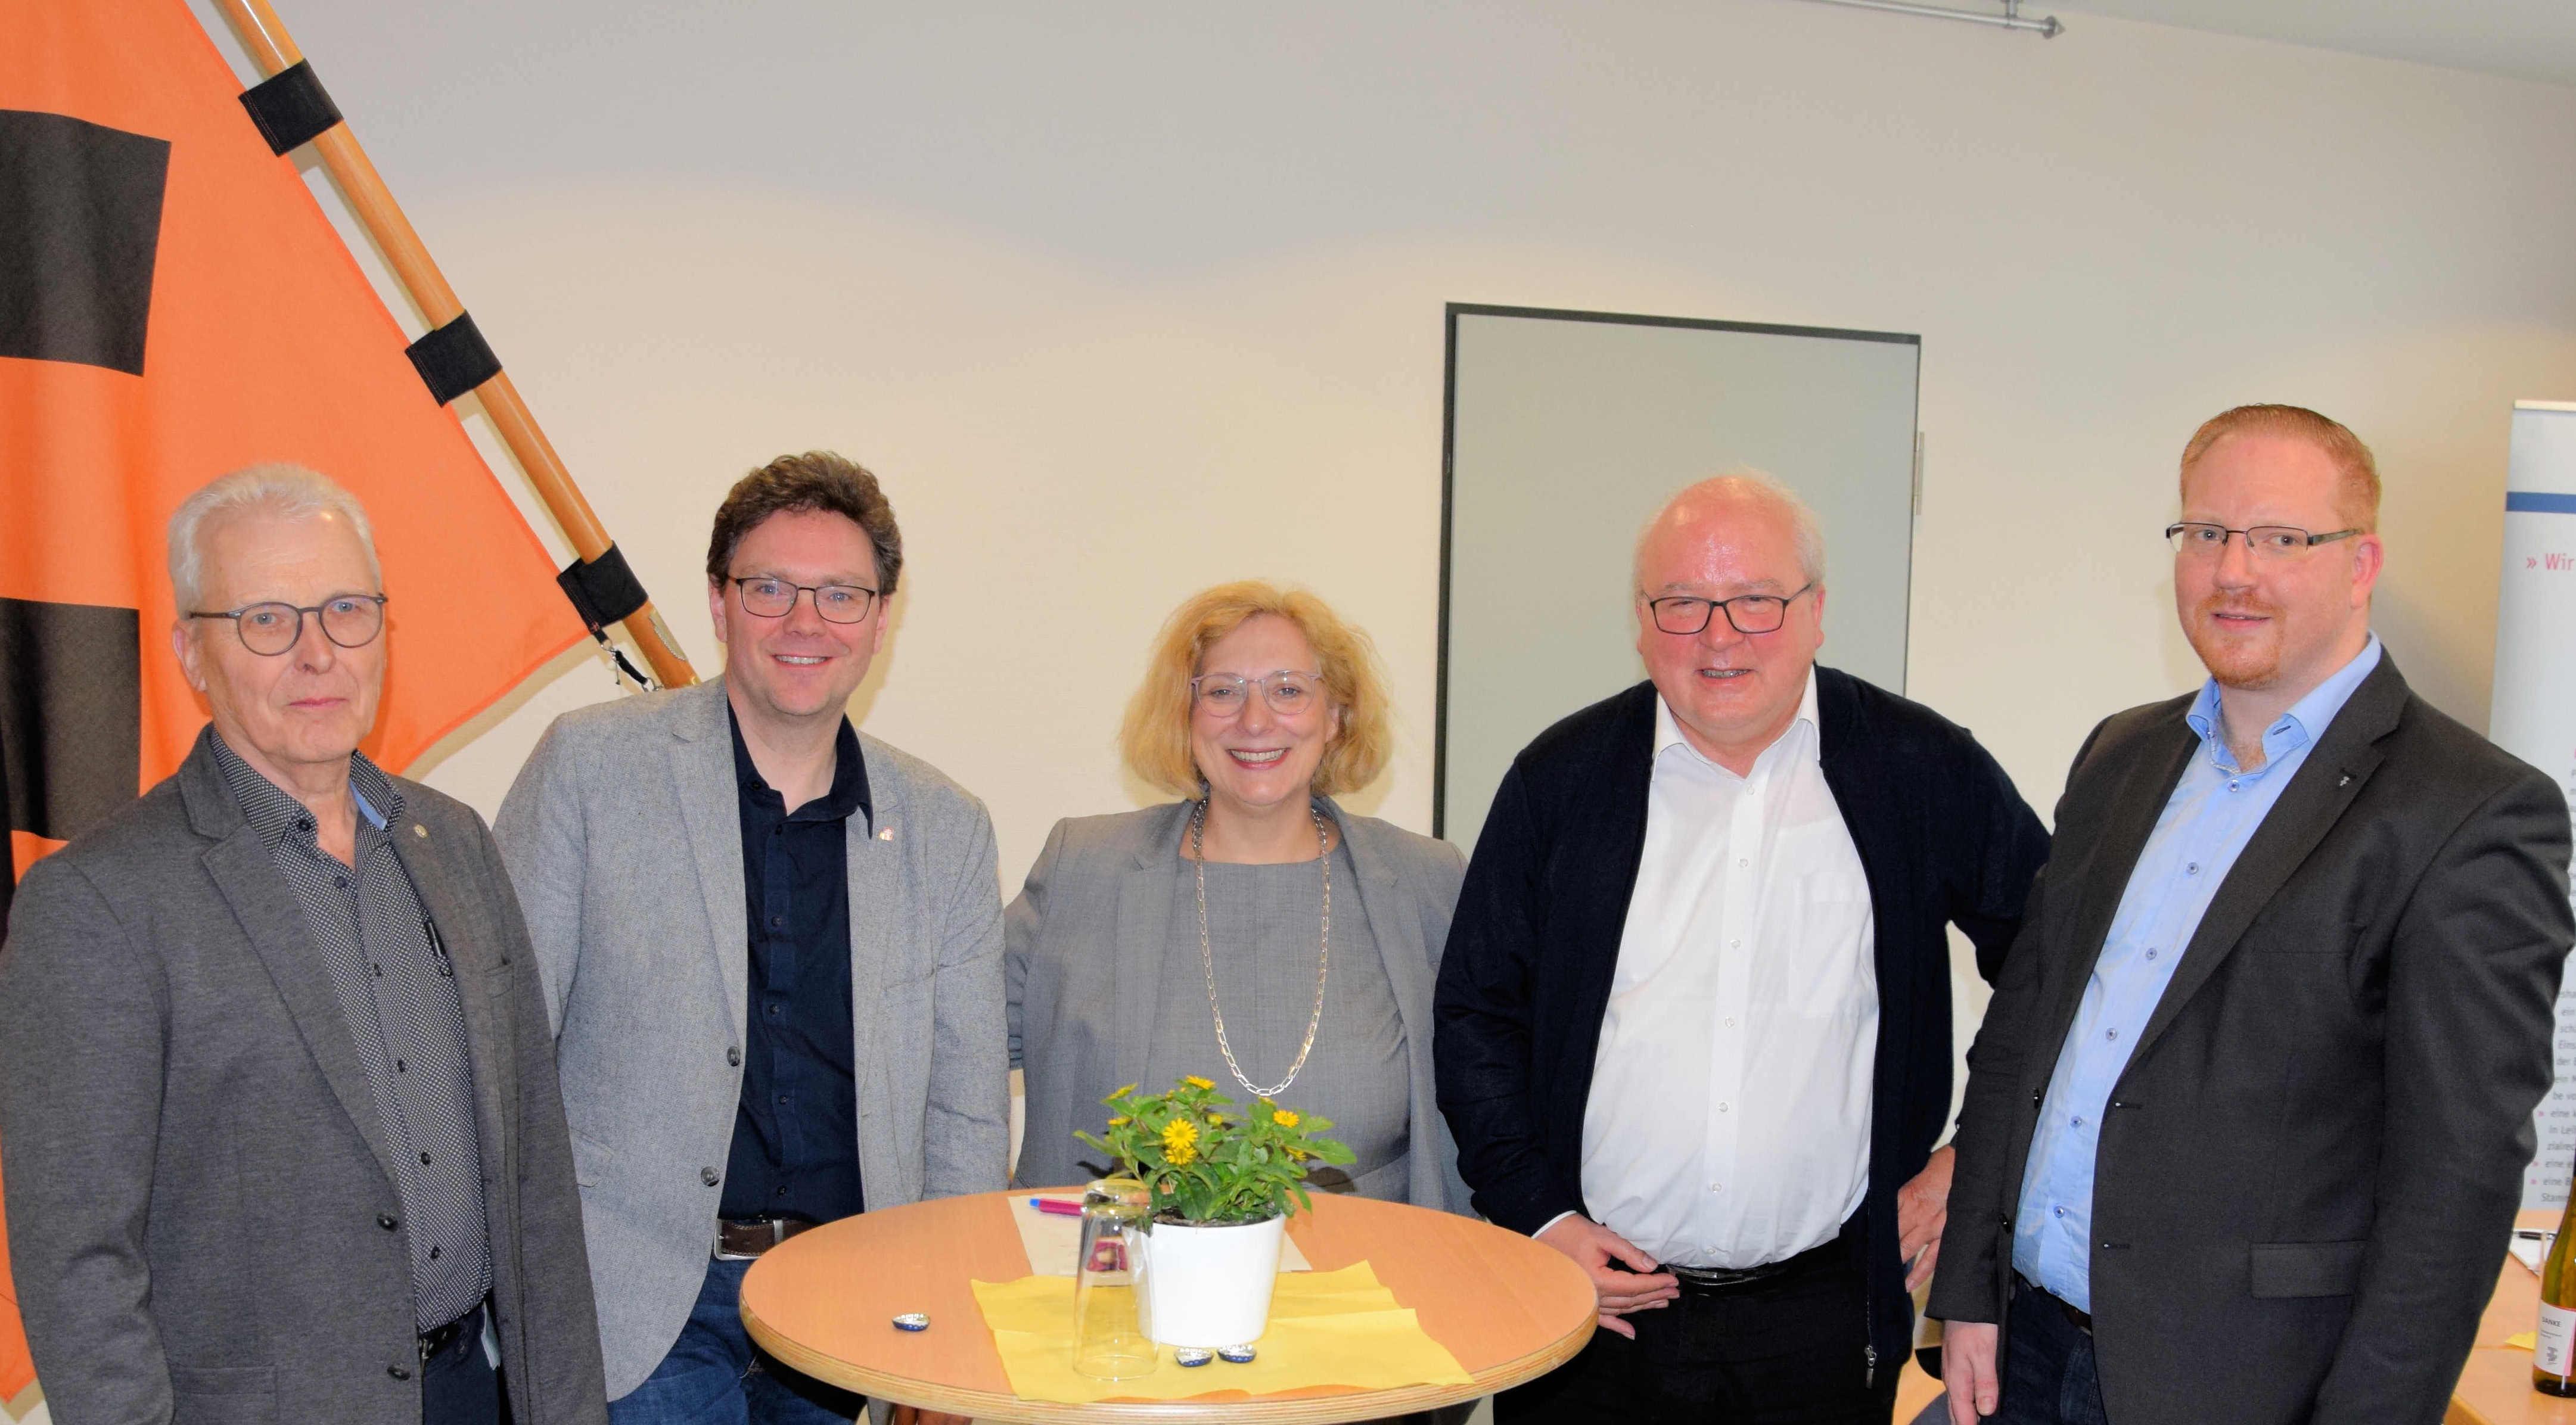 V.l.n.r.: Hermann Strieker, Marcus Drees, Dr. Daniela De Ridder, Generalvikar Theo Paul und Marcel Völtz